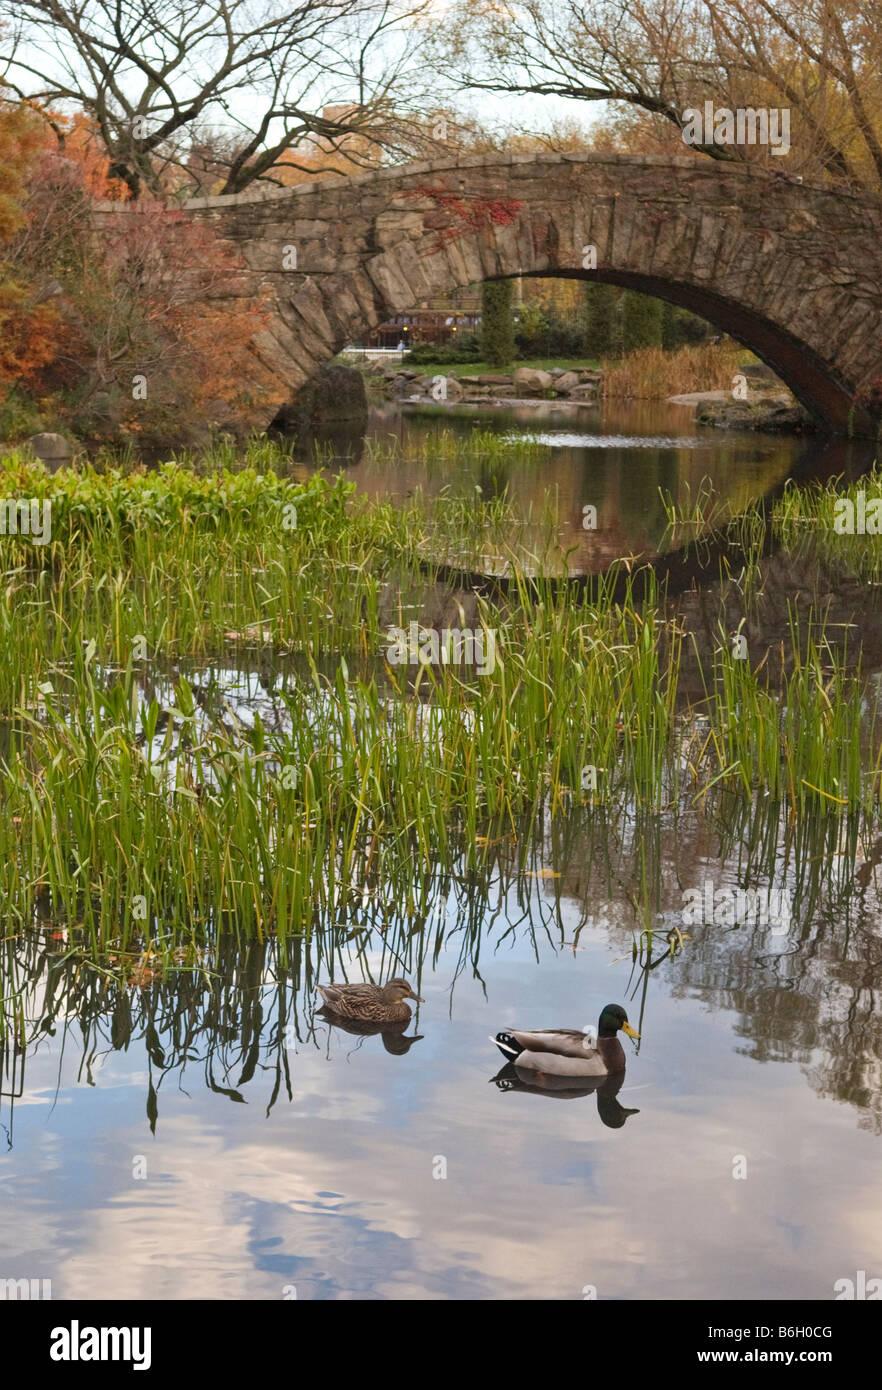 Gapstow Bridge in Central Park, New York City - Stock Image